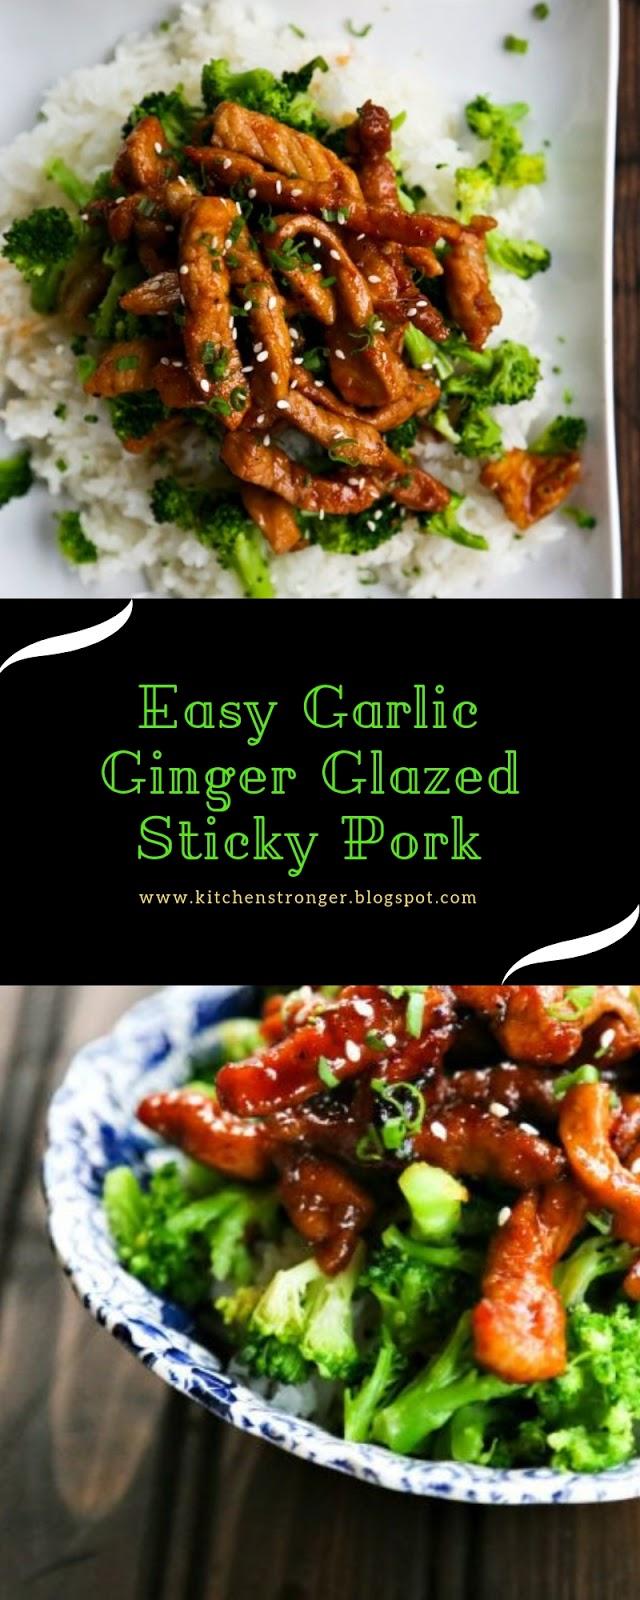 Easy Garlic Ginger Glazed Sticky Pork